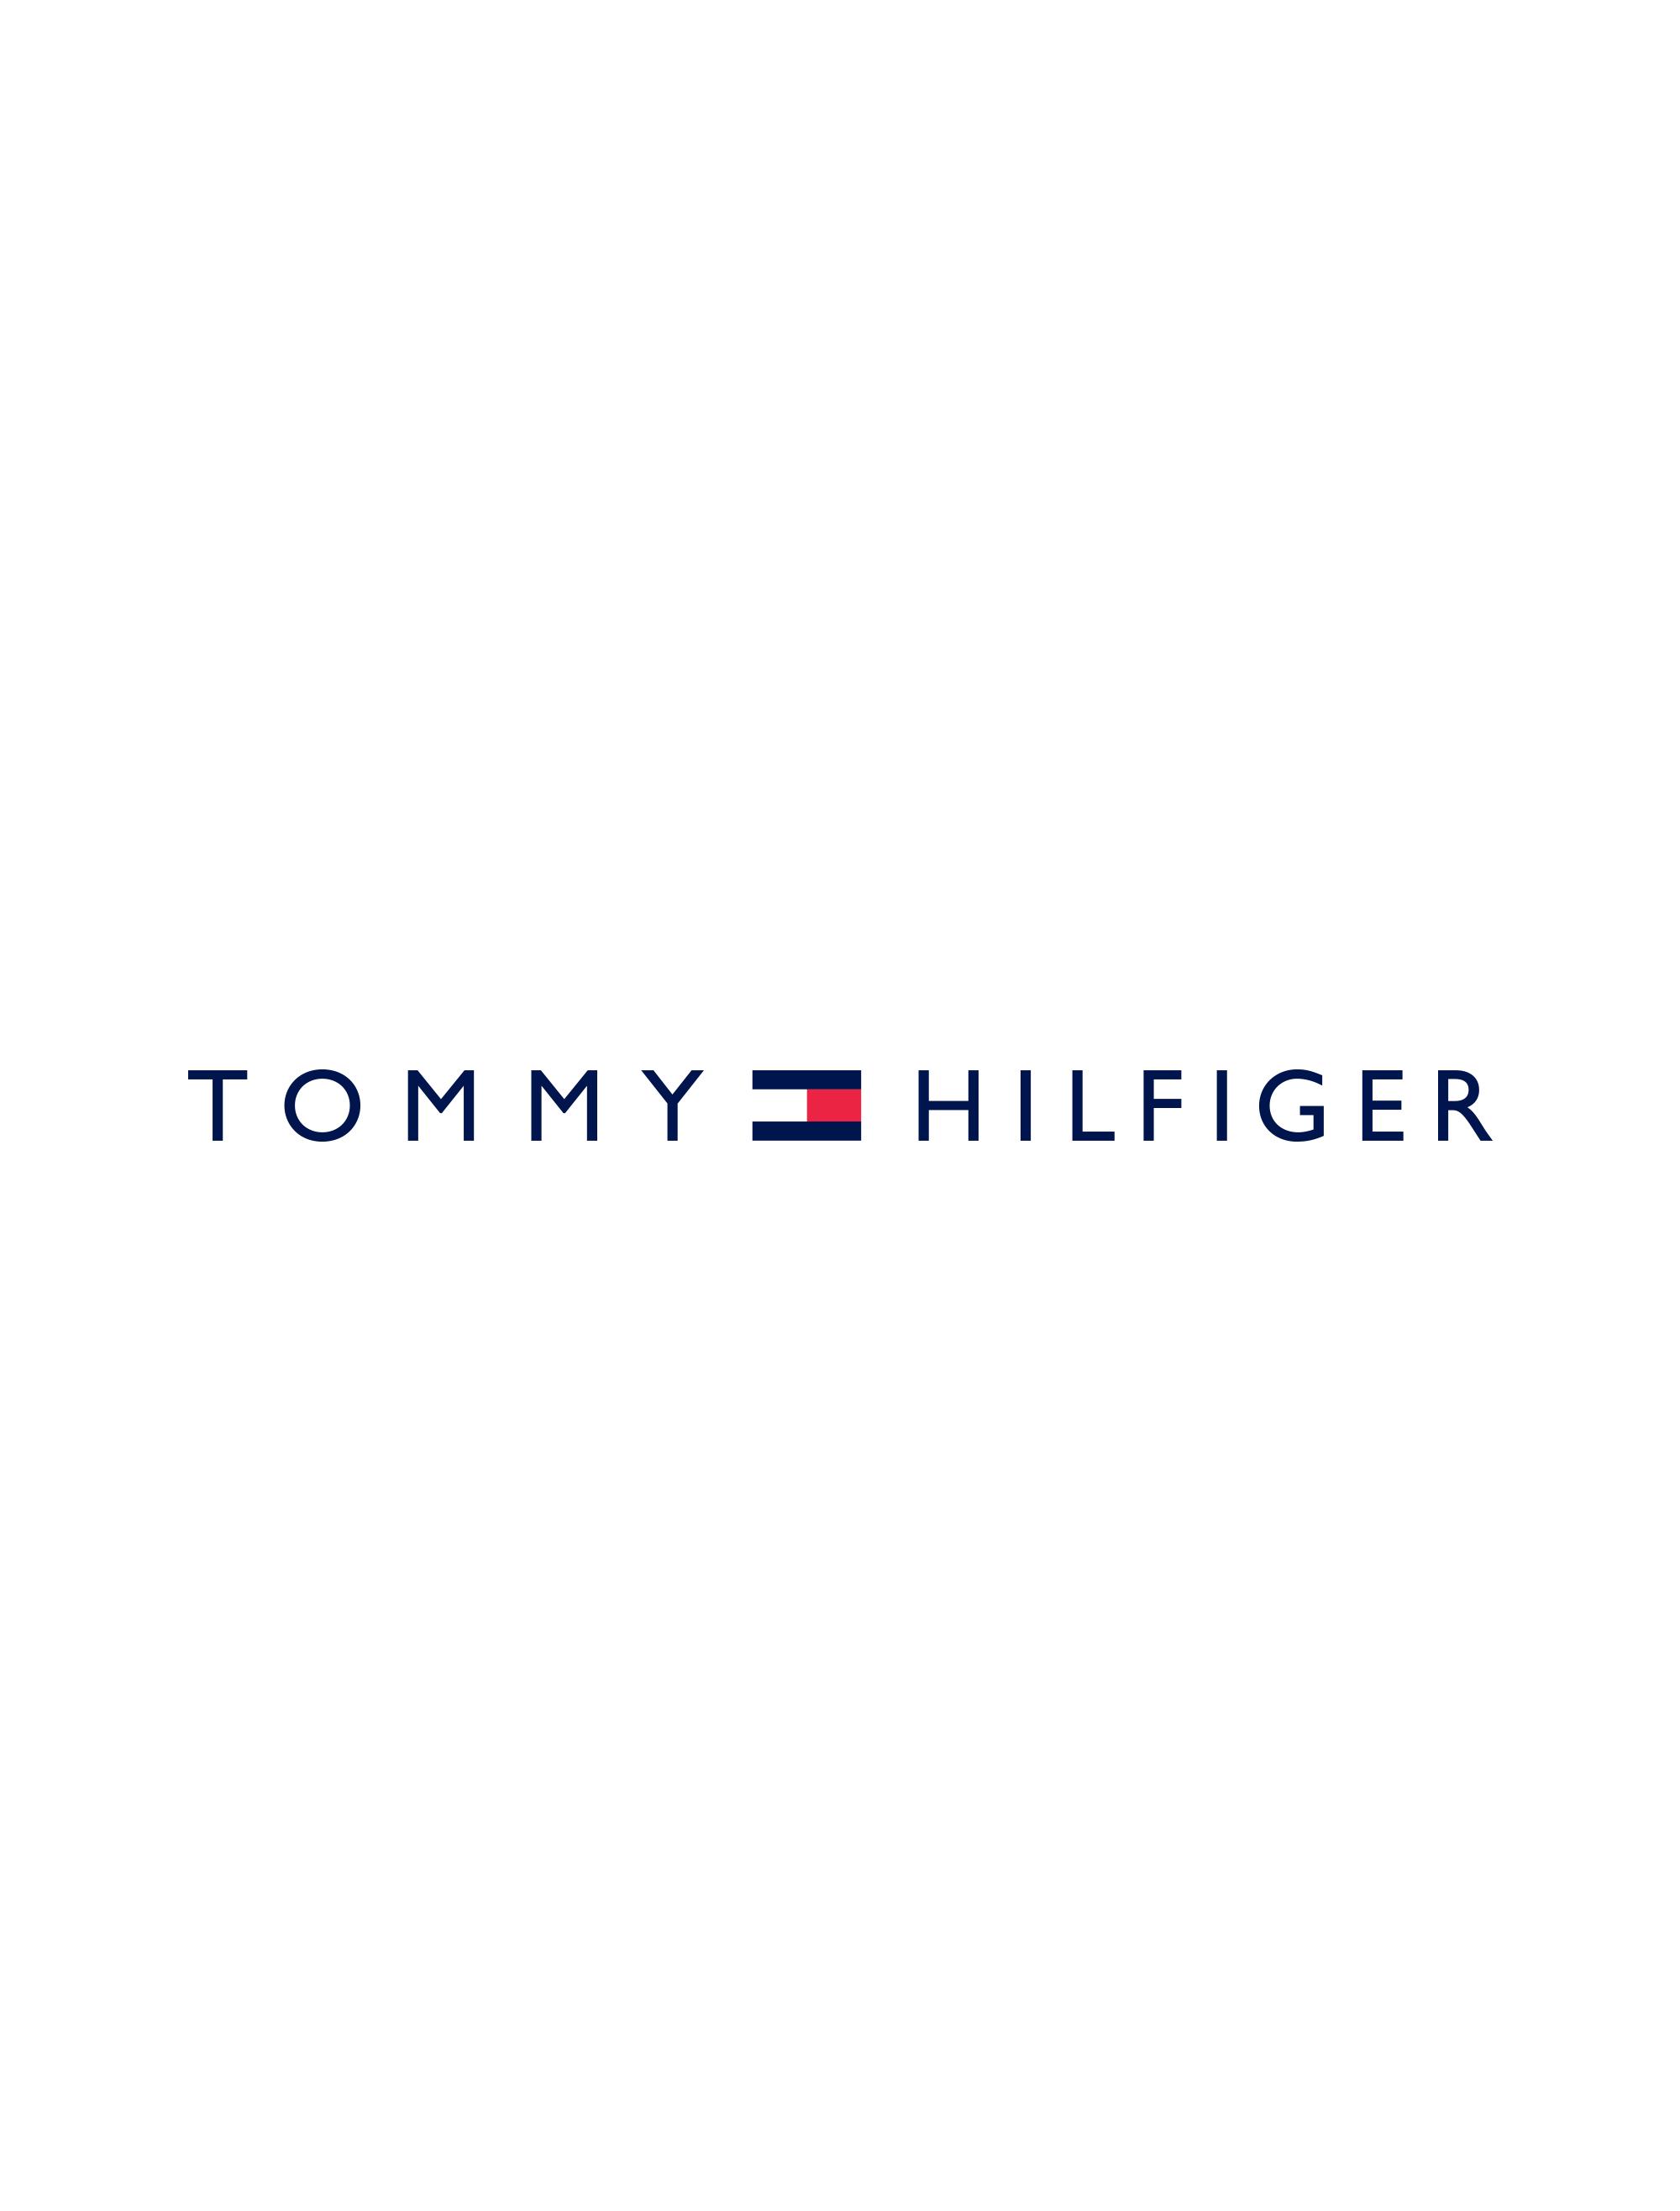 Tommy Hilfiger Yacht Sailing Jacket